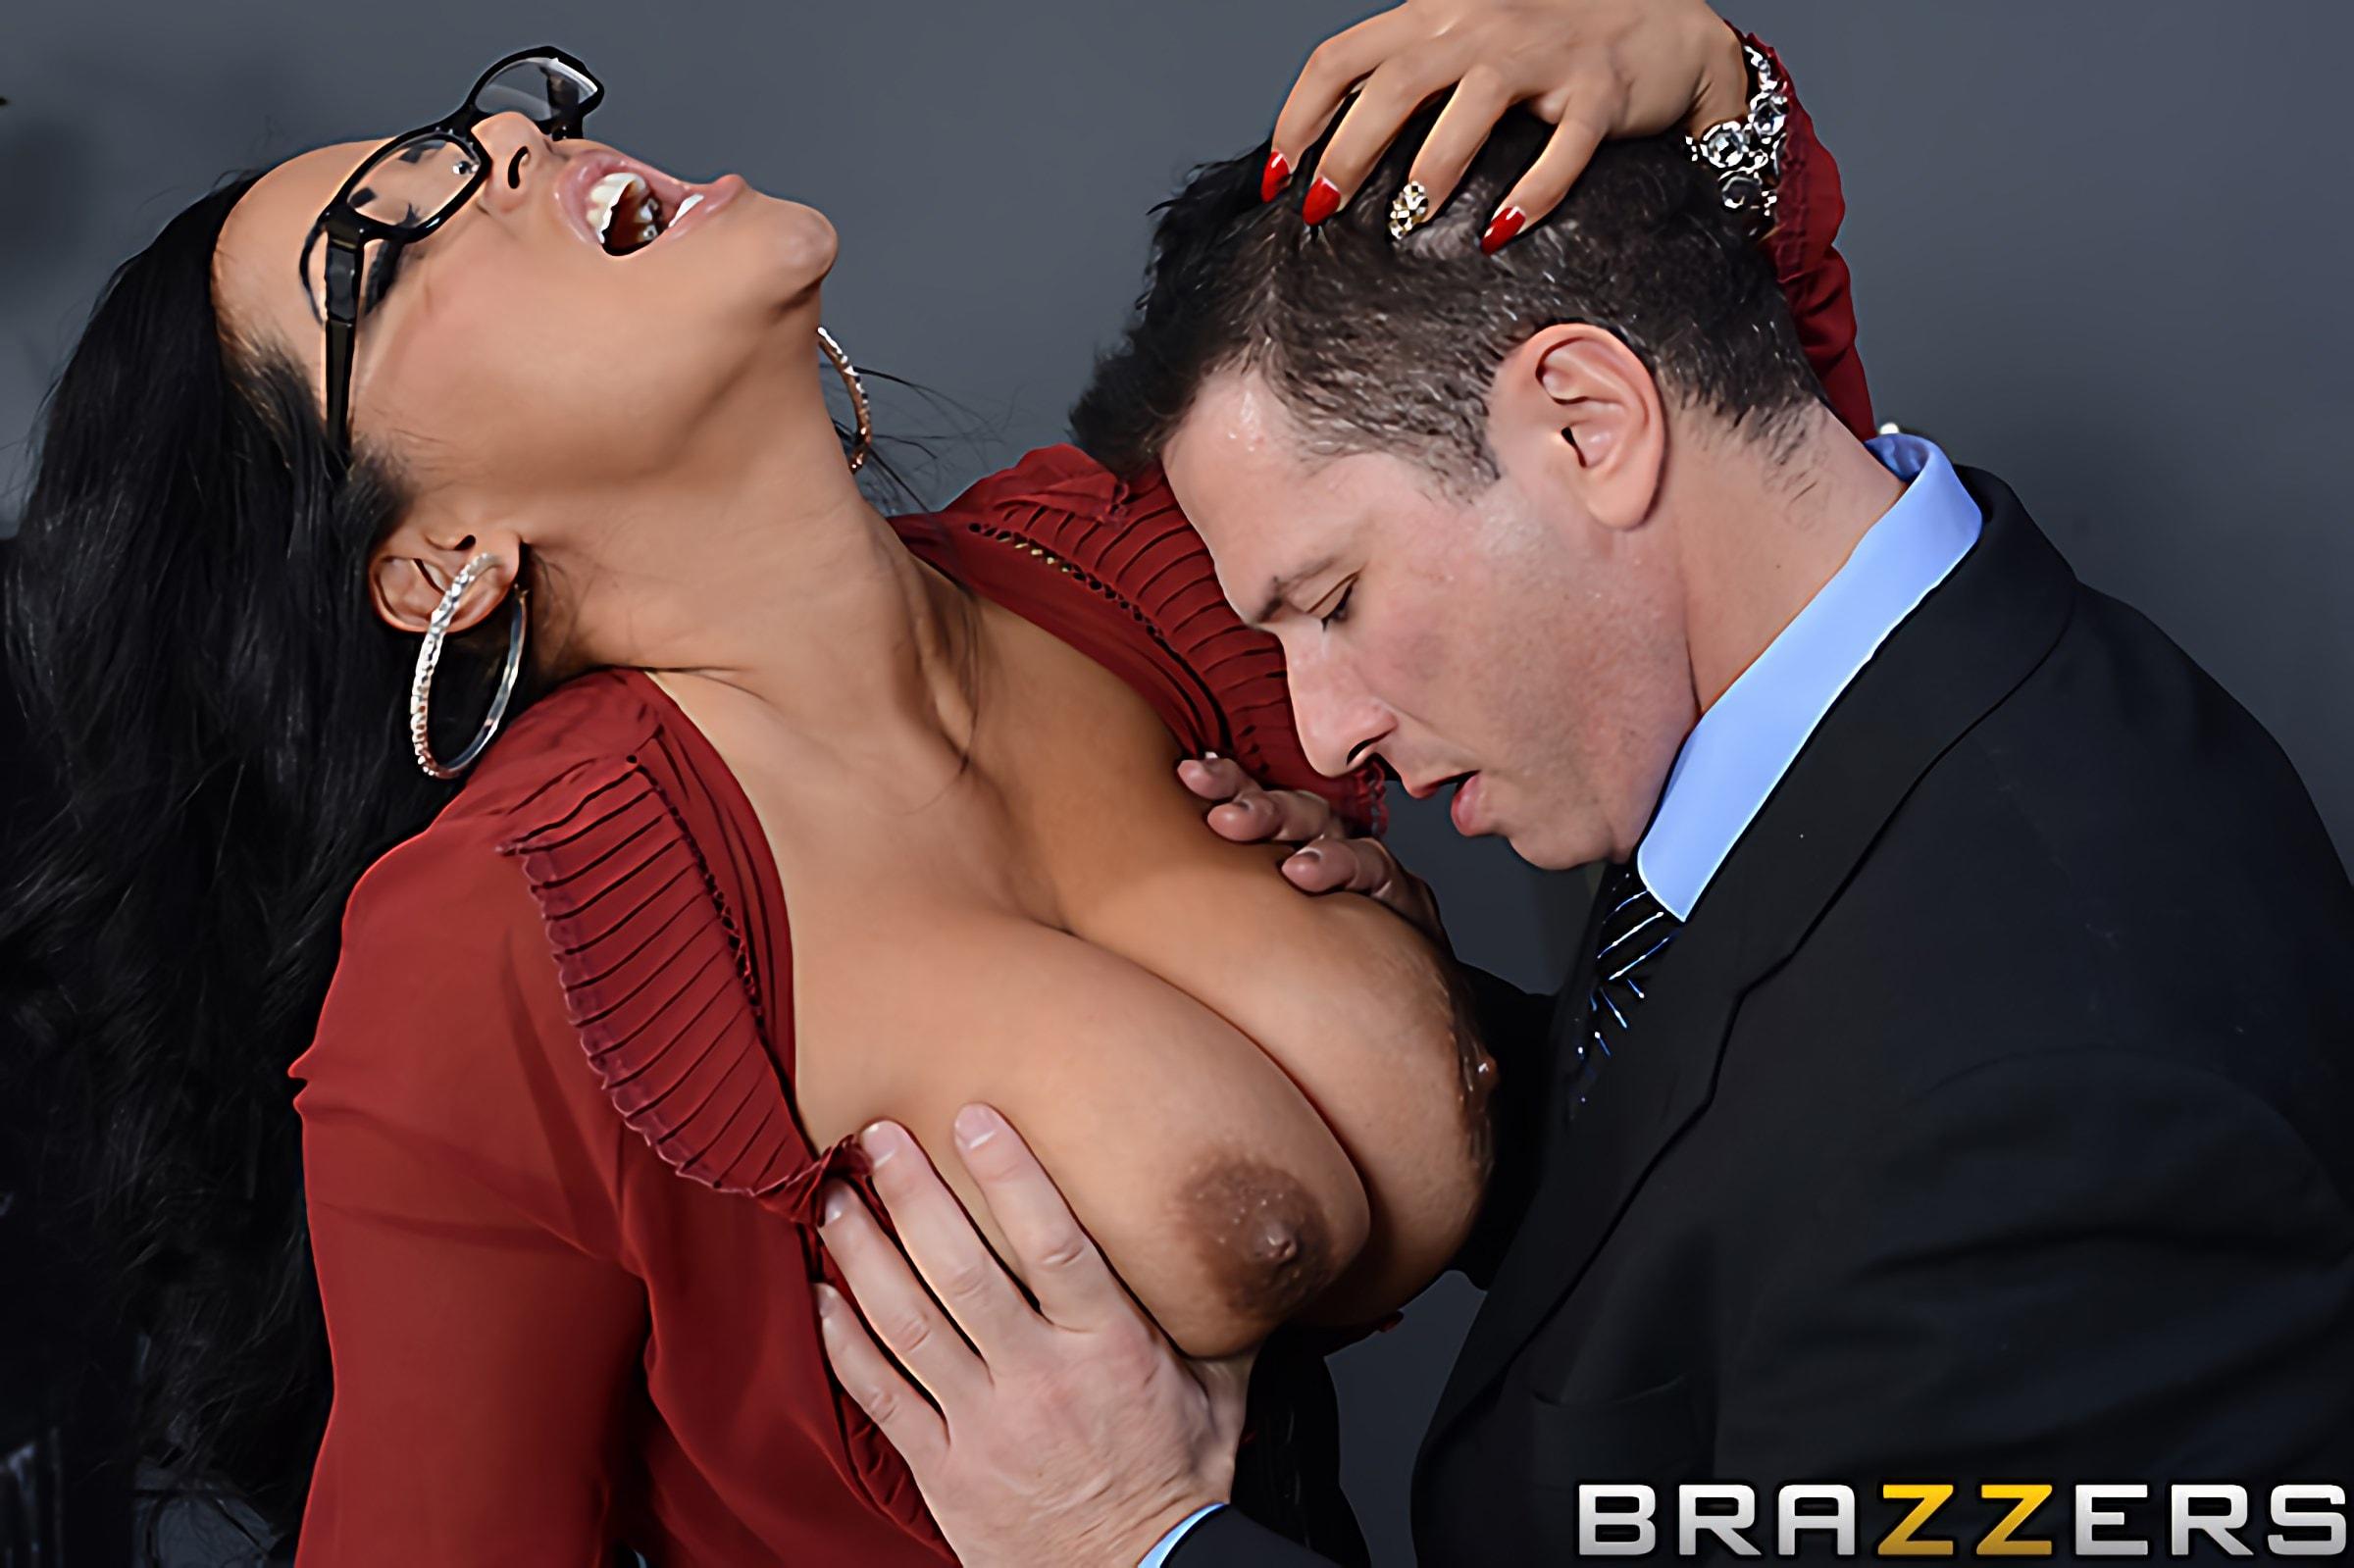 Brazzers 'My Boss Is A Creep' starring Kiara Mia (Photo 9)